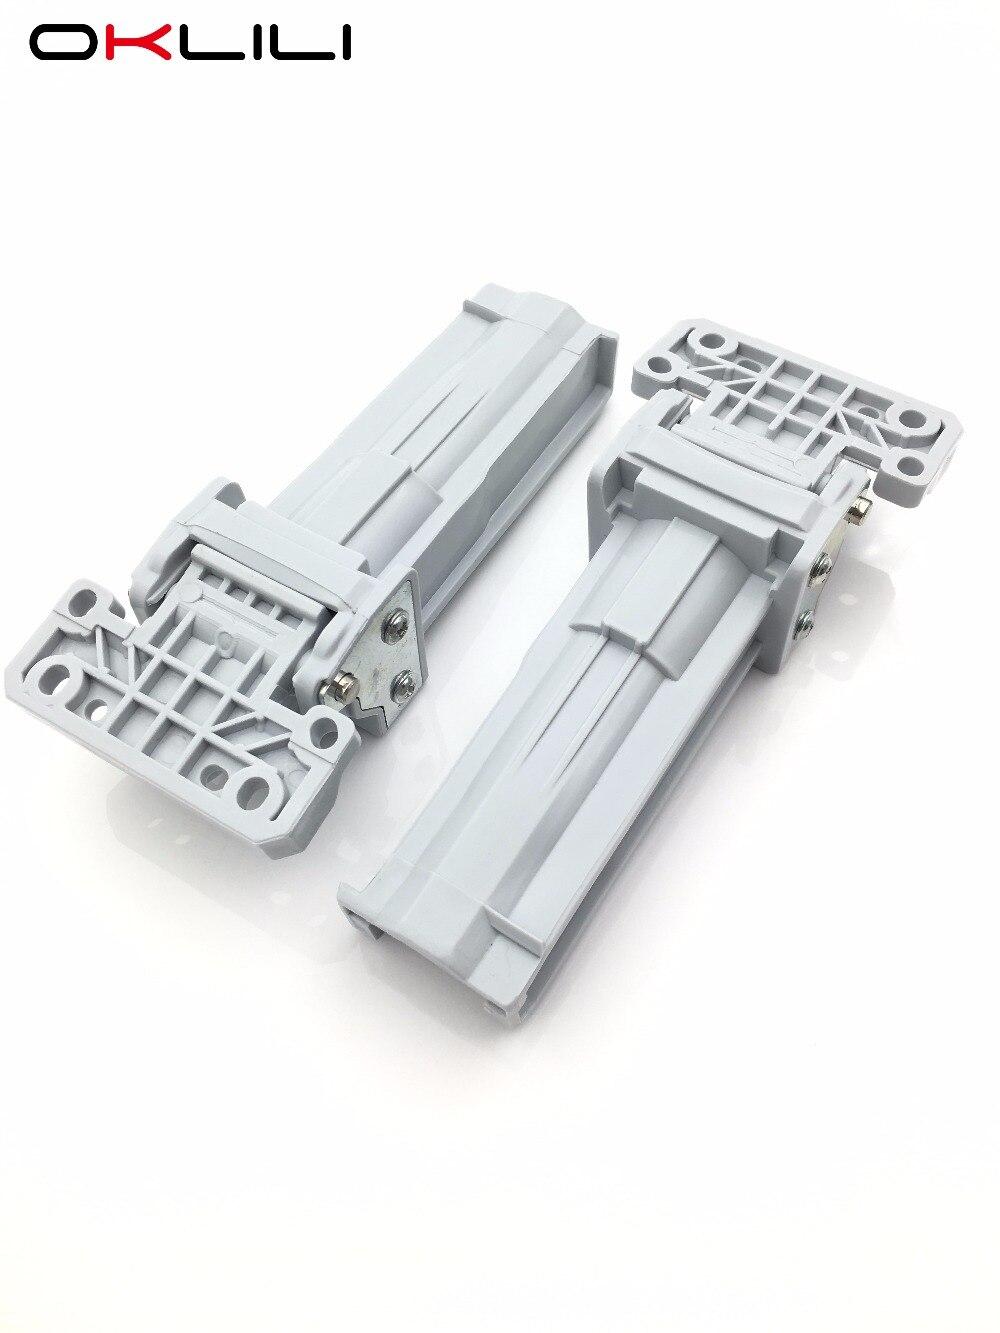 2PCX NEW Q7404-60029 Q7404-60024 Q7404-60025 ADF Hinge Assembly ASM ASSY-HINGE-HR for HP 500 MFP M525 M575 M521 M775 CM4540 new original for hp m575 m525 m775 adf hinge assembly q7404 60024 printer parts on sale